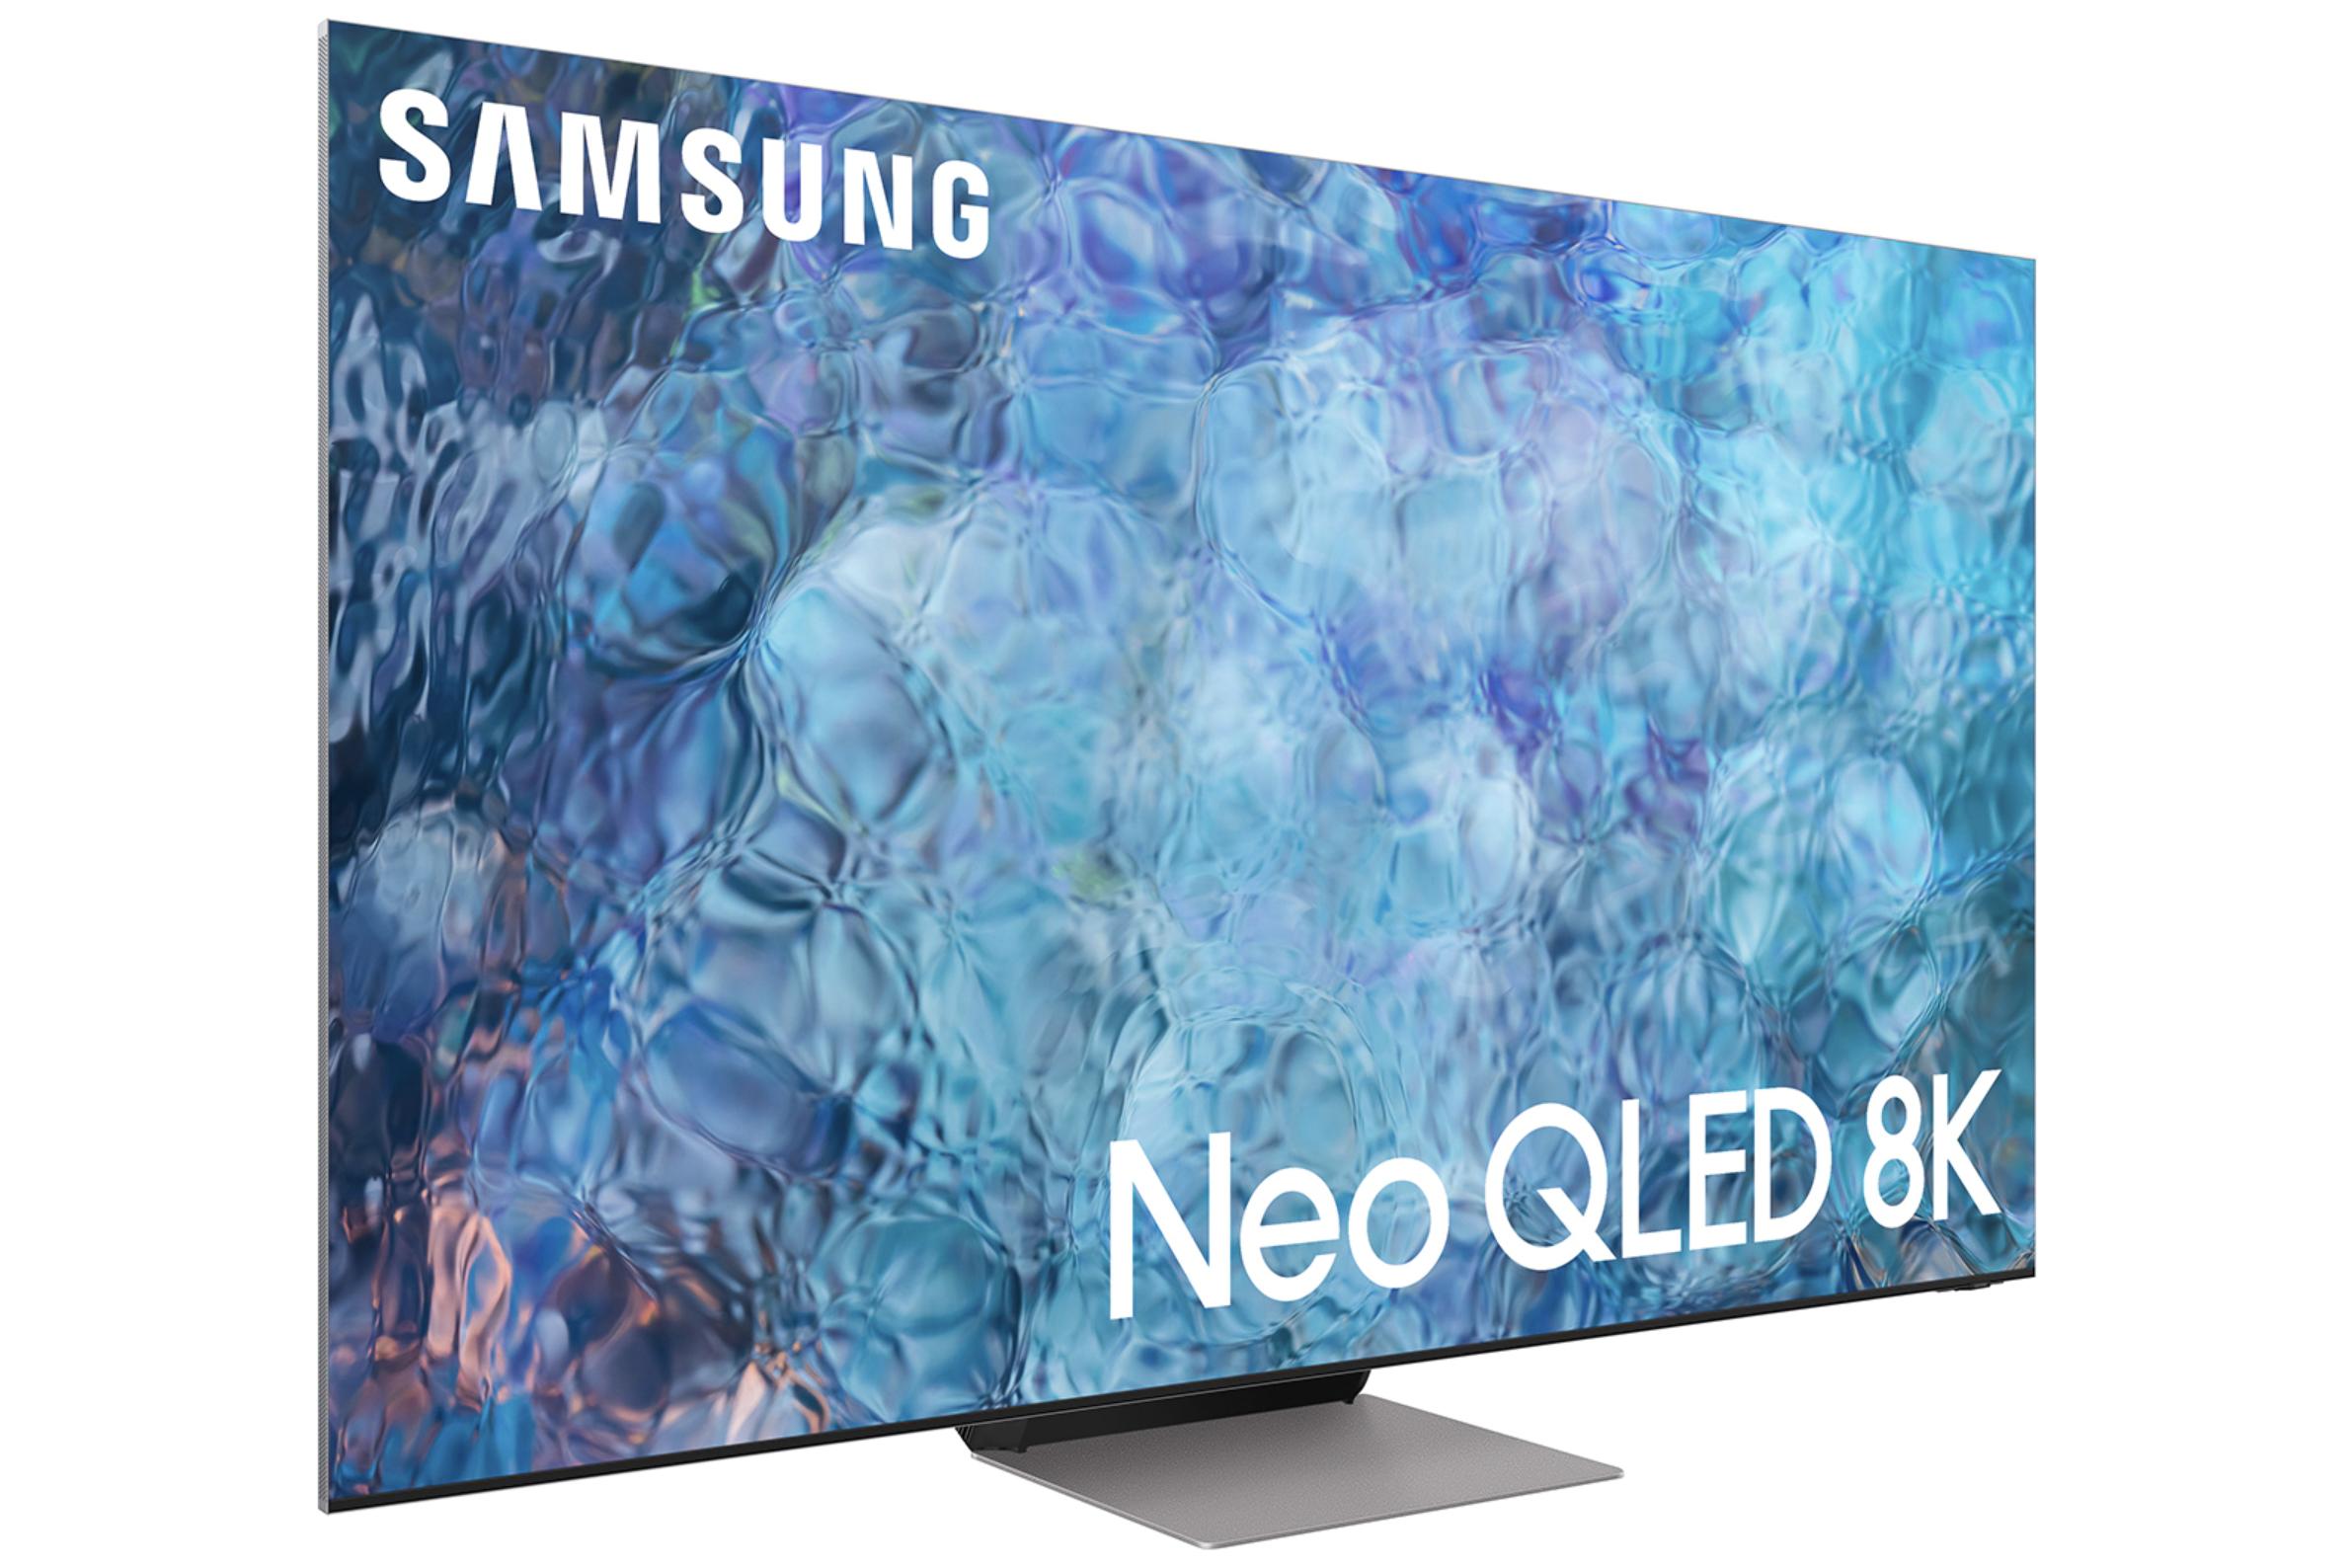 samsung neo QN900A 8k tv discount